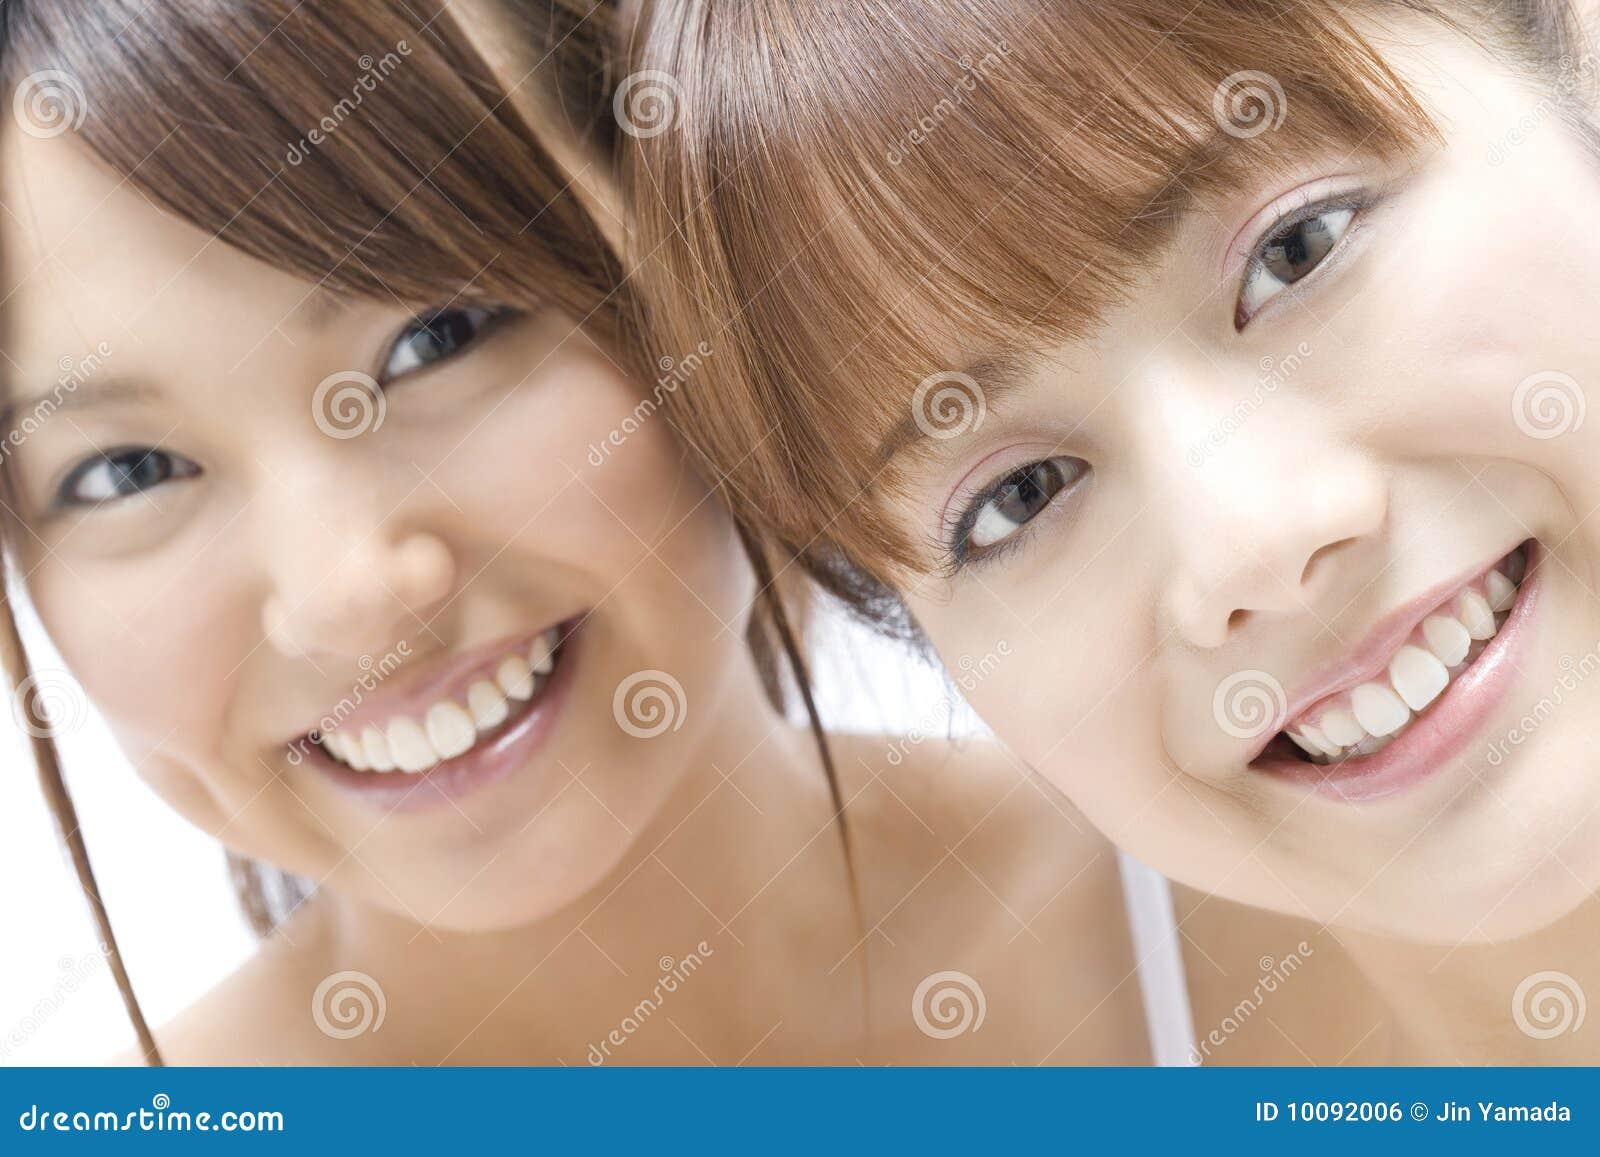 Portrait of Japanese women